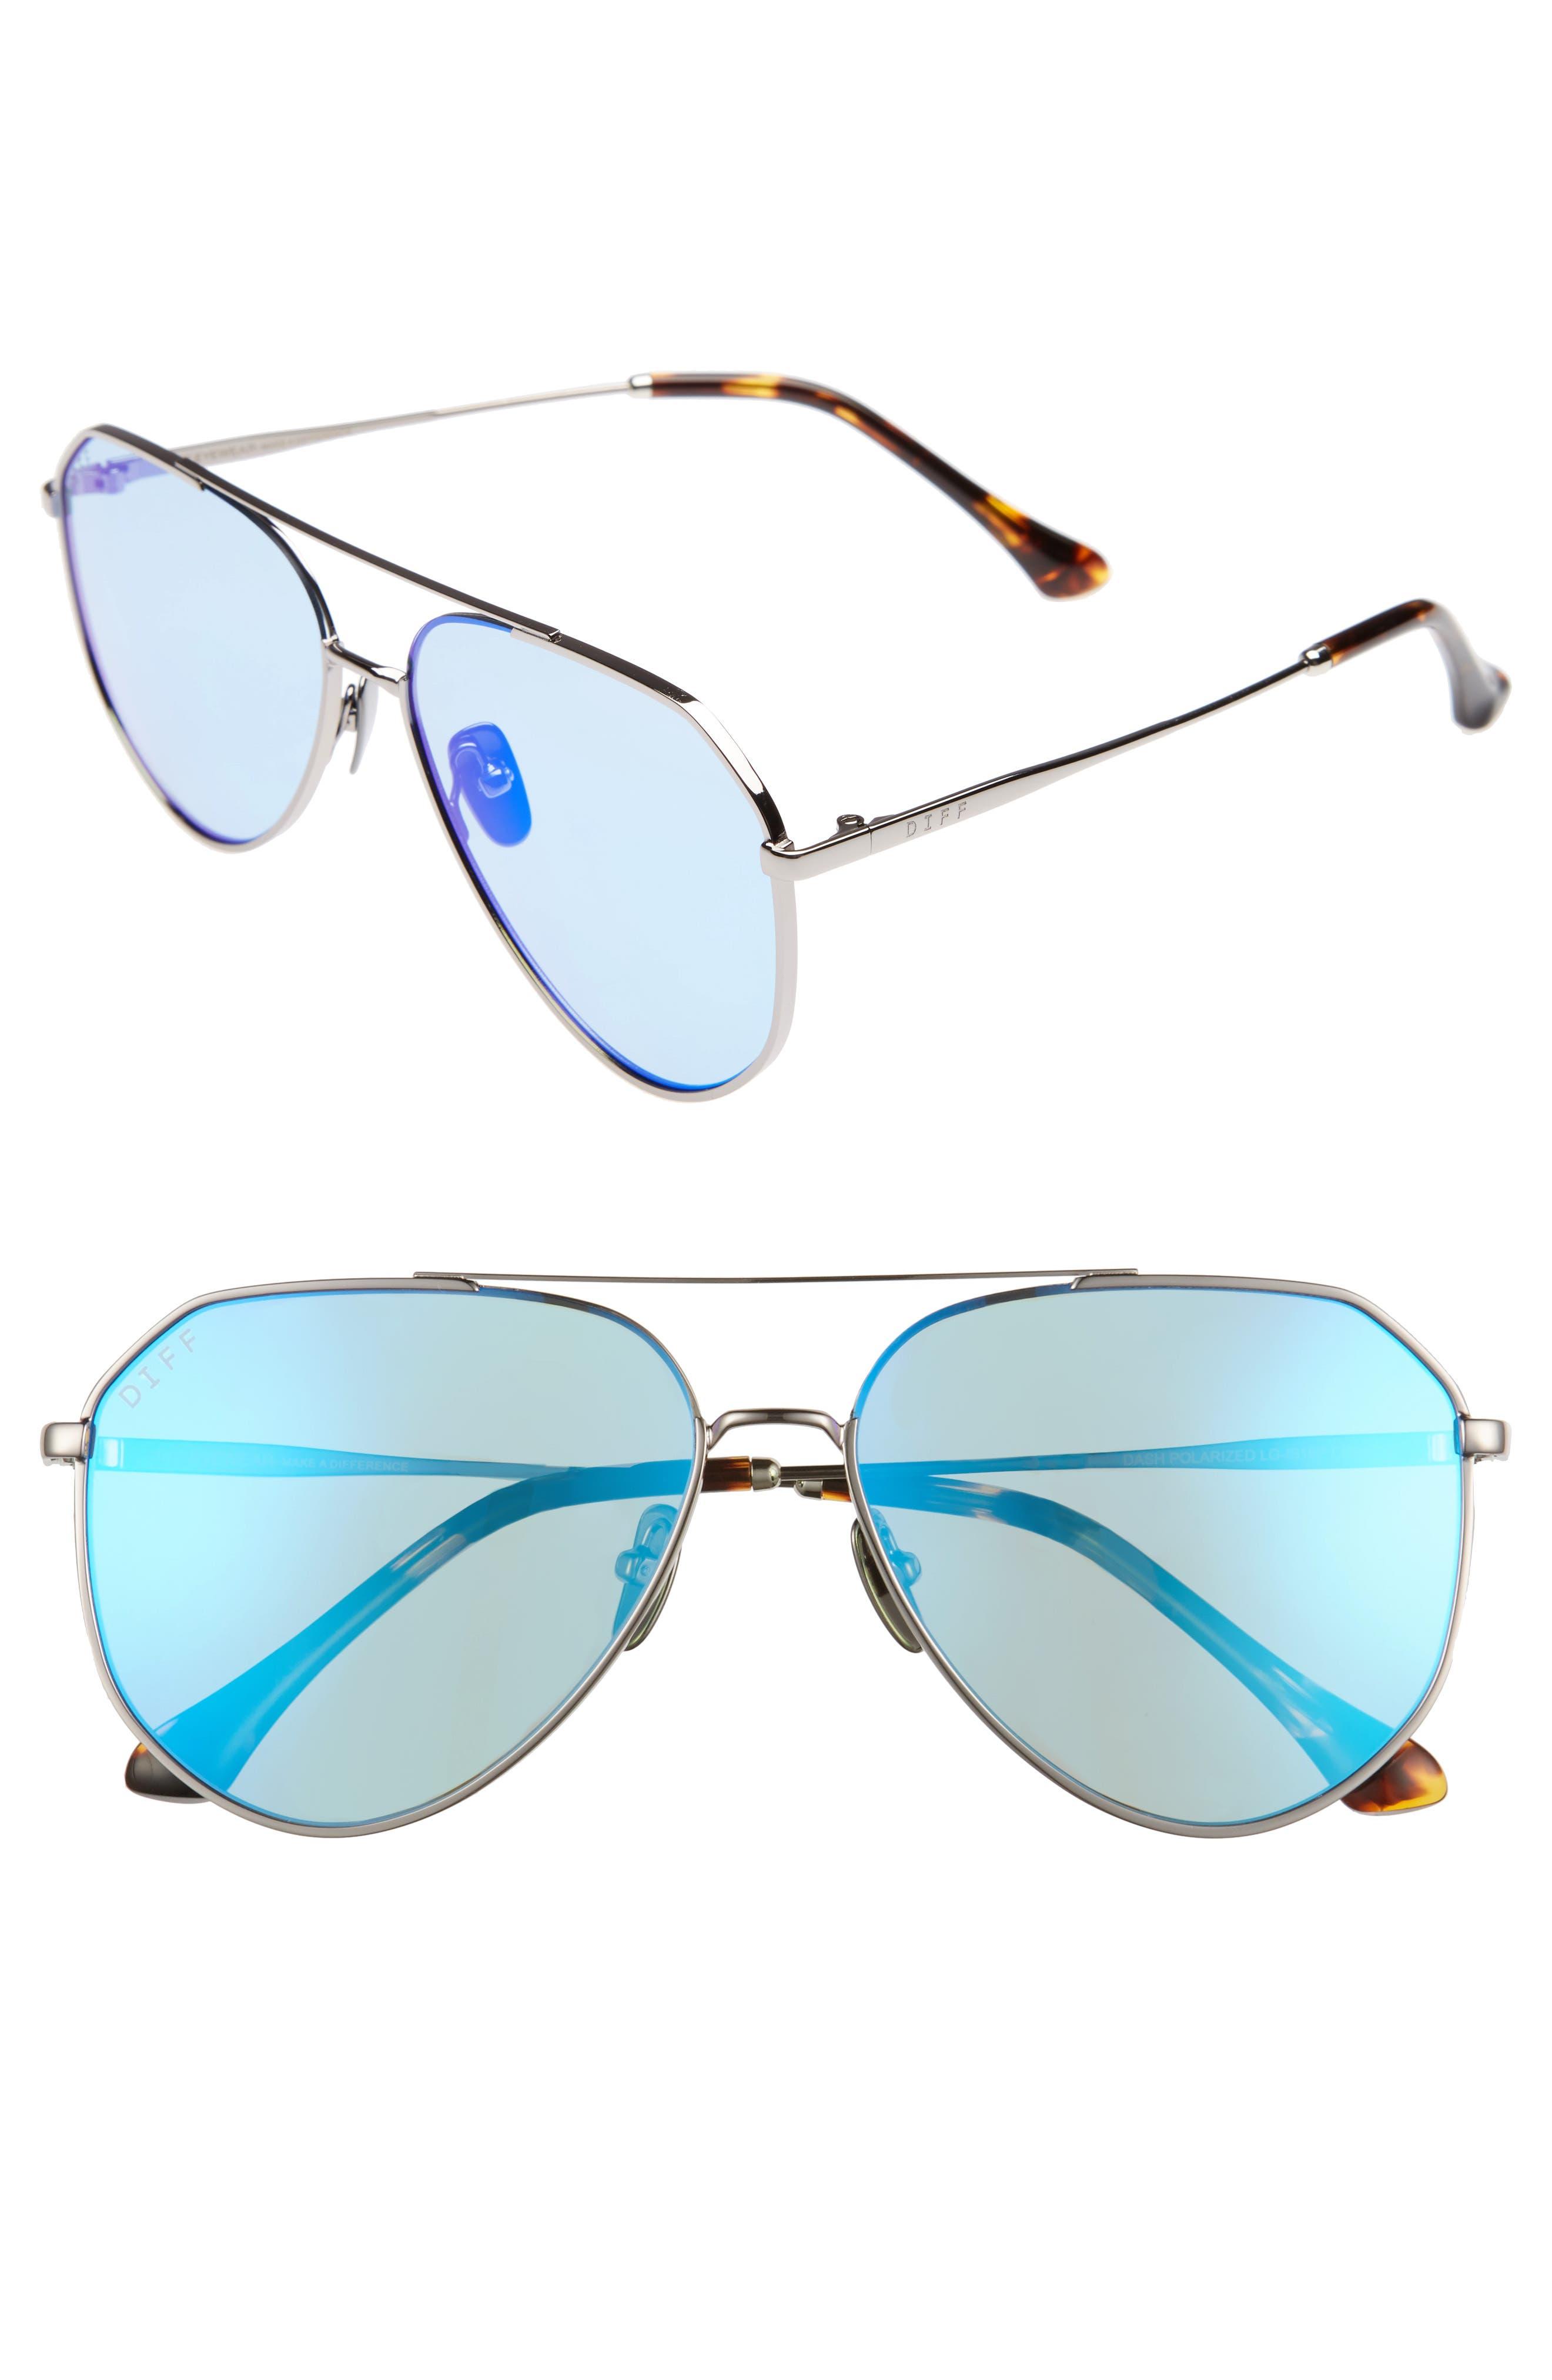 DIFF Dash 61mm Polarized Aviator Sunglasses